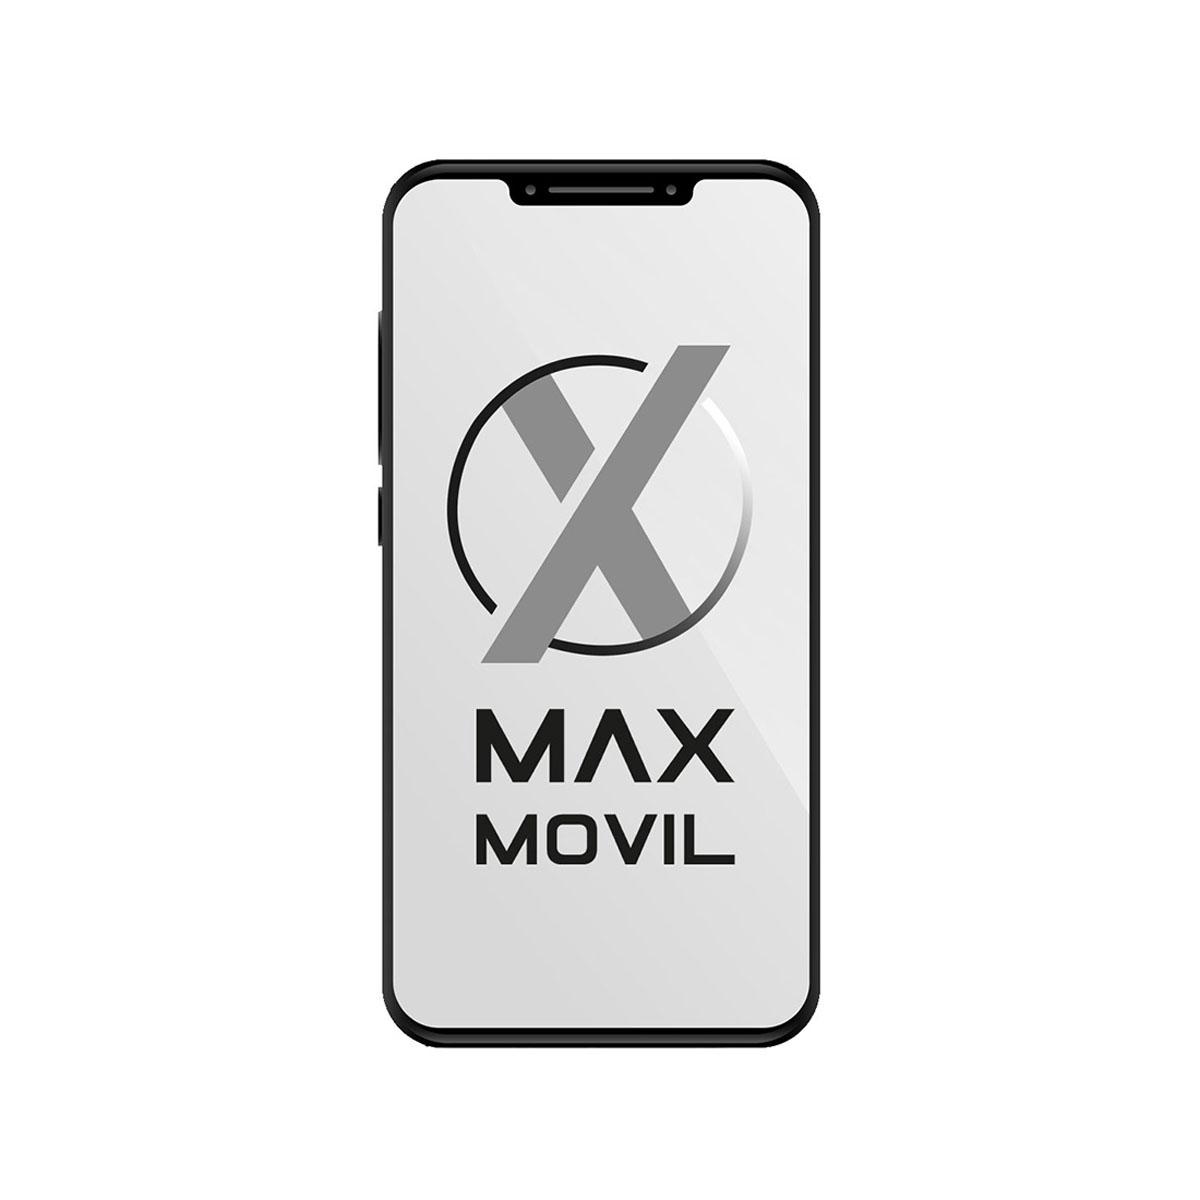 "Tablet Samsung Galaxy Tab S2 Wifi 8.0"" T713 envío gratis en MAXmovil"